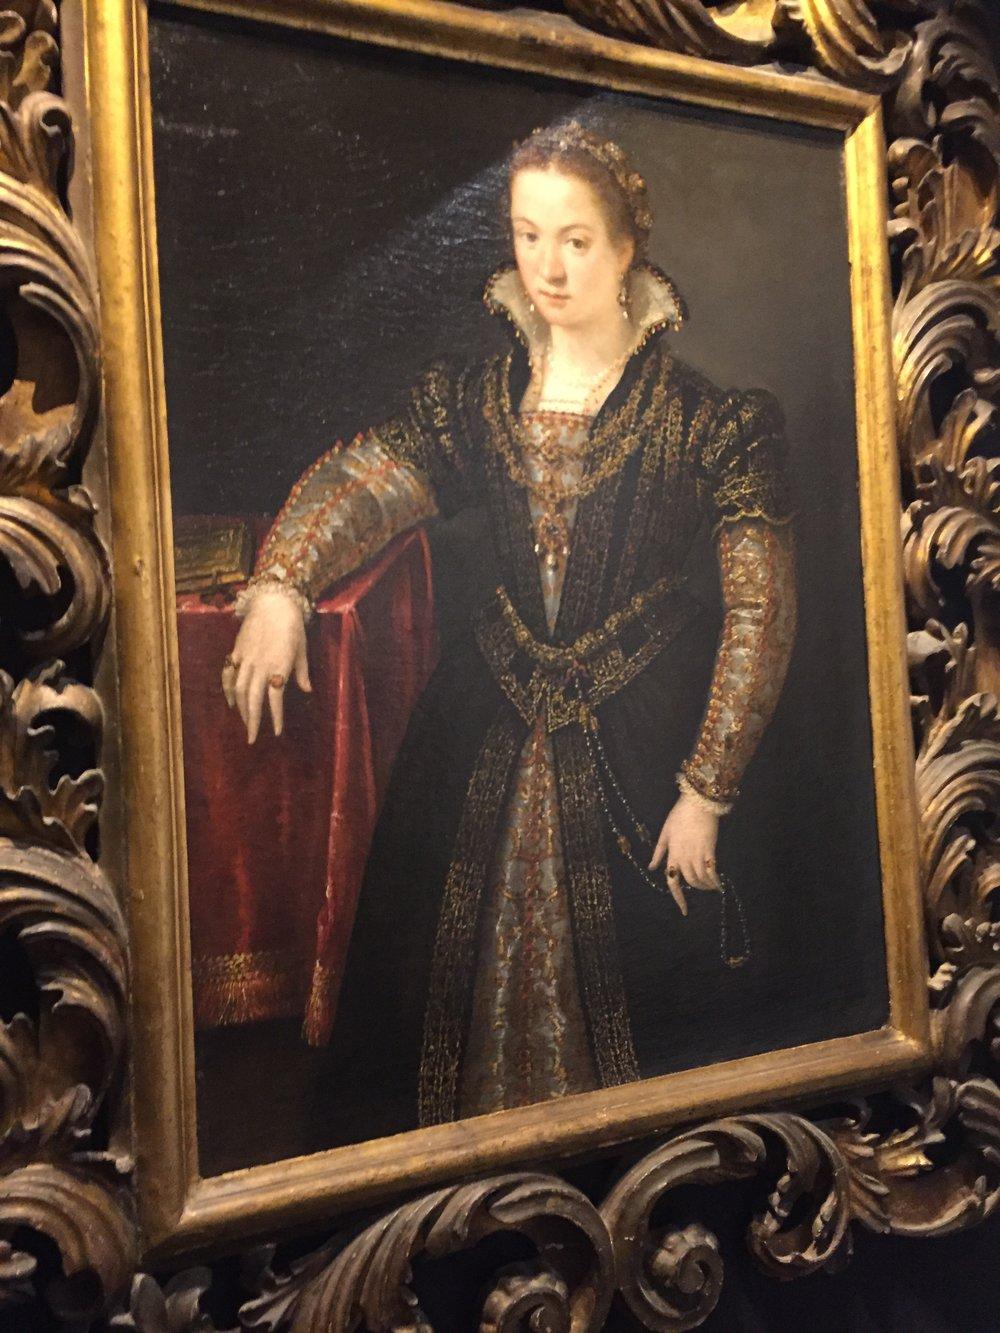 Lavina Fontana Portrait - Robert Simon Fine Art.jpg